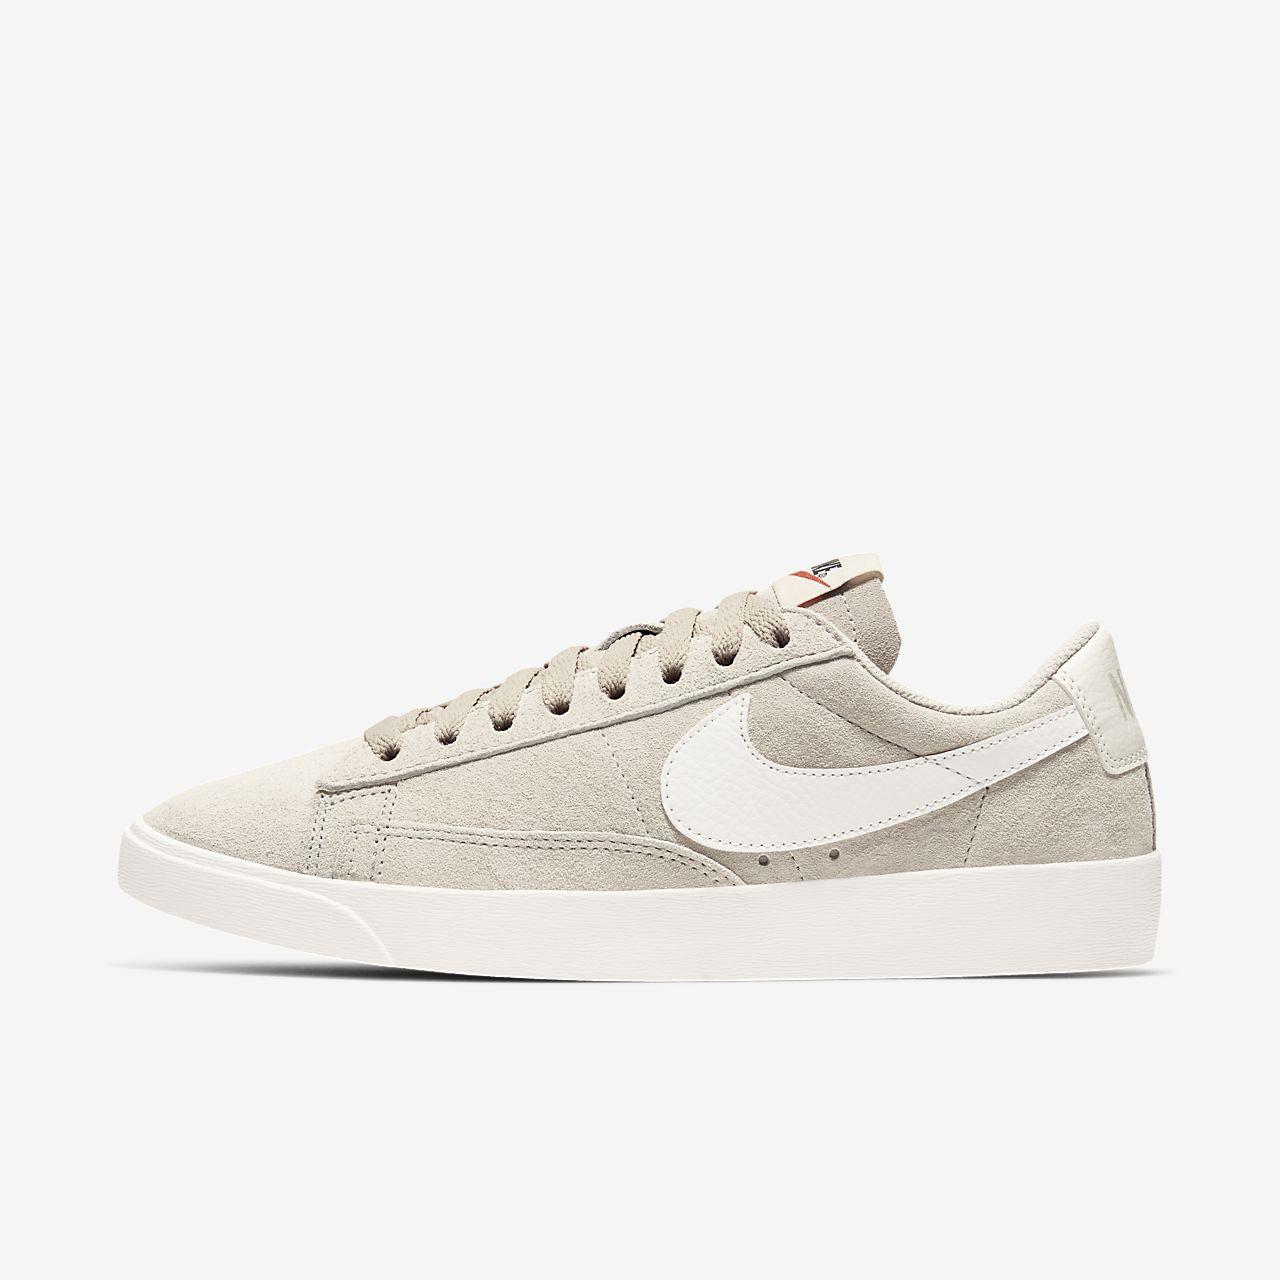 65df407bd59 Nike Blazer Low Suede Women s Shoe. Nike.com